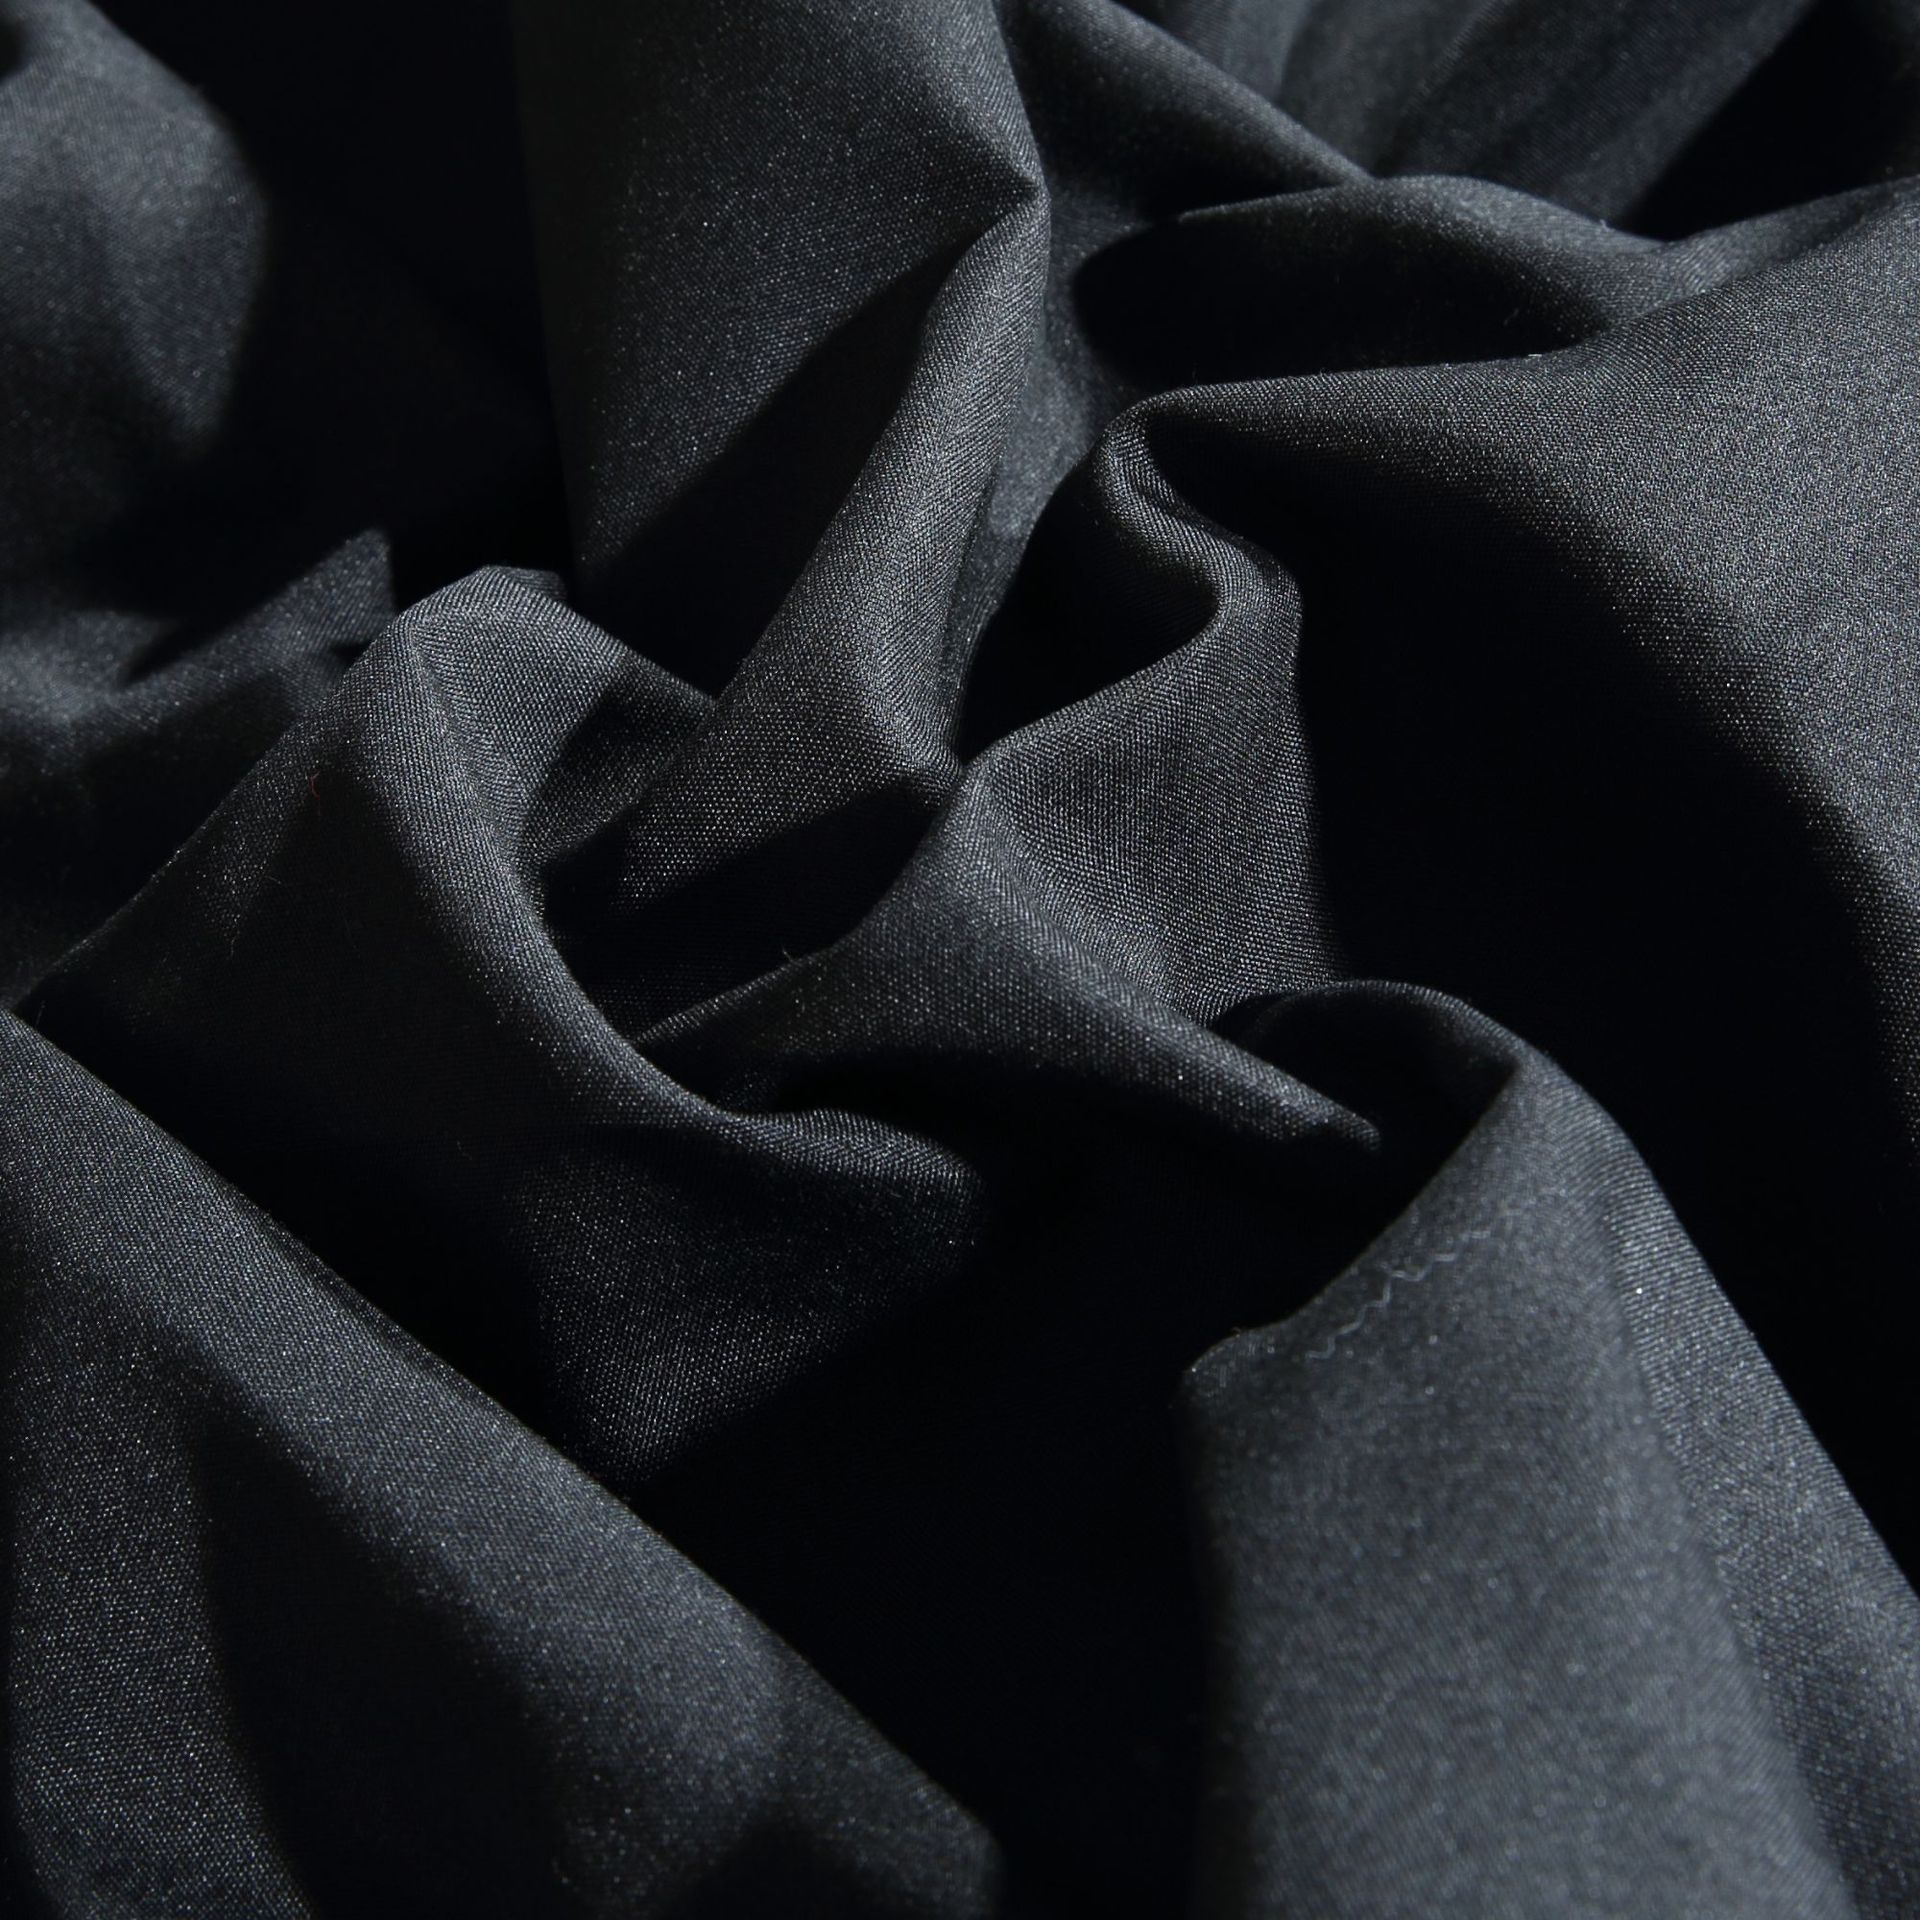 Image 3 - LOVINSUNSHINE Luxury Duvet Cover Bedding Set King Size Silk Bed Linen Duvet Cover Set Queen Black AC02#-in Bedding Sets from Home & Garden